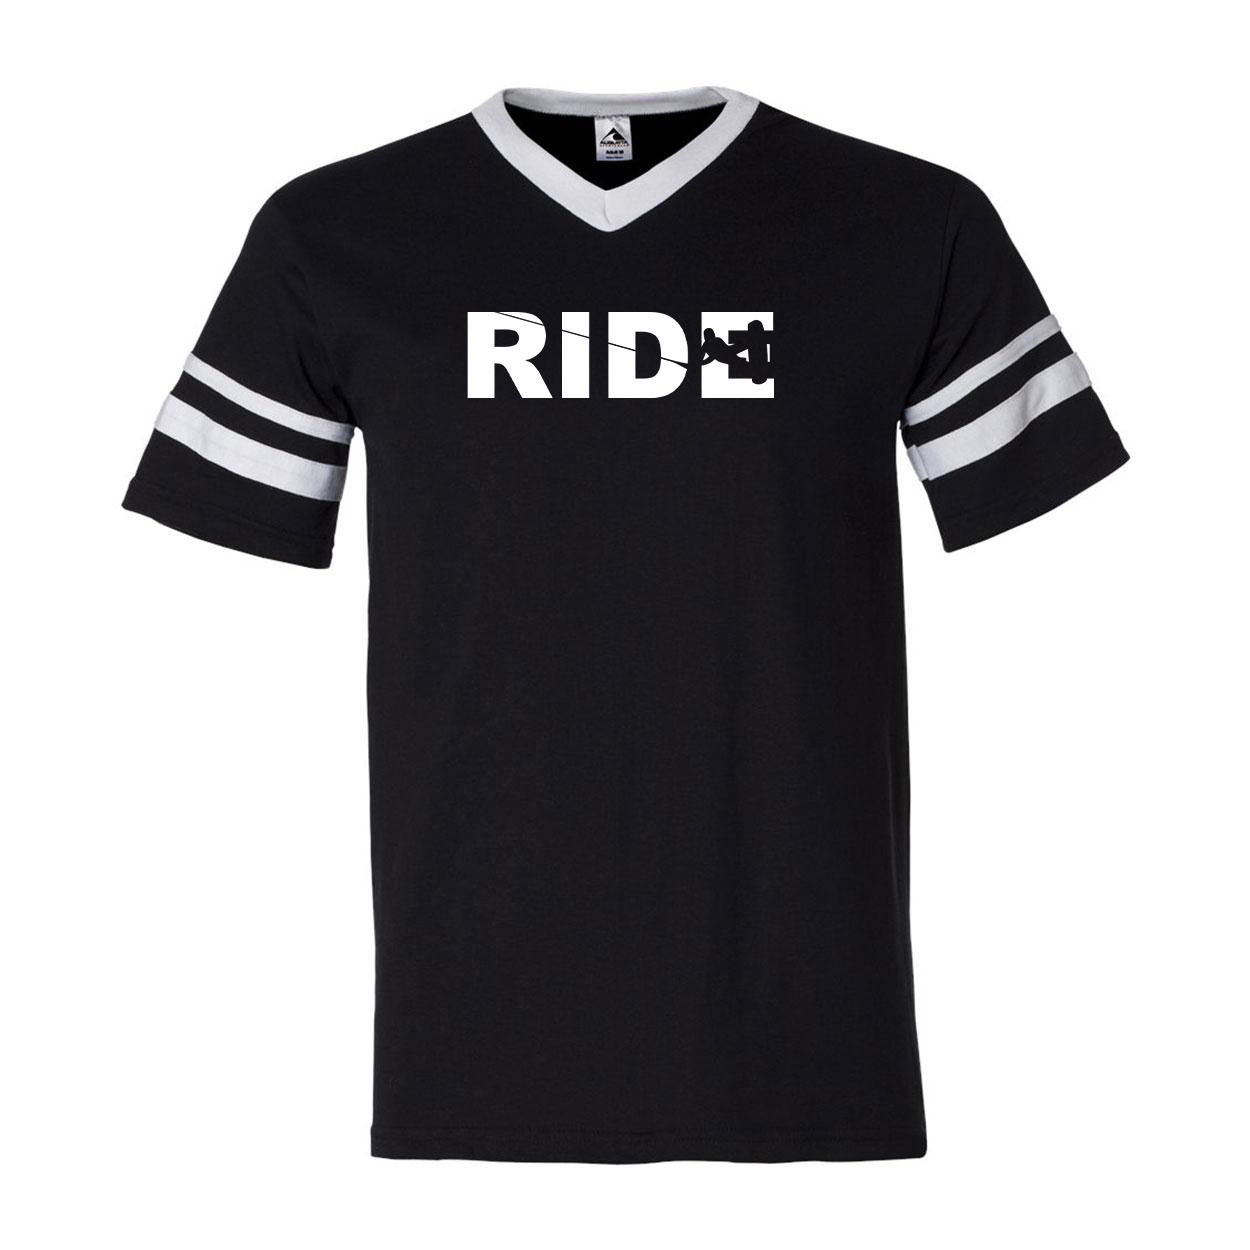 Ride Wakeboard Logo Classic Premium Striped Jersey T-Shirt Black/White (White Logo)